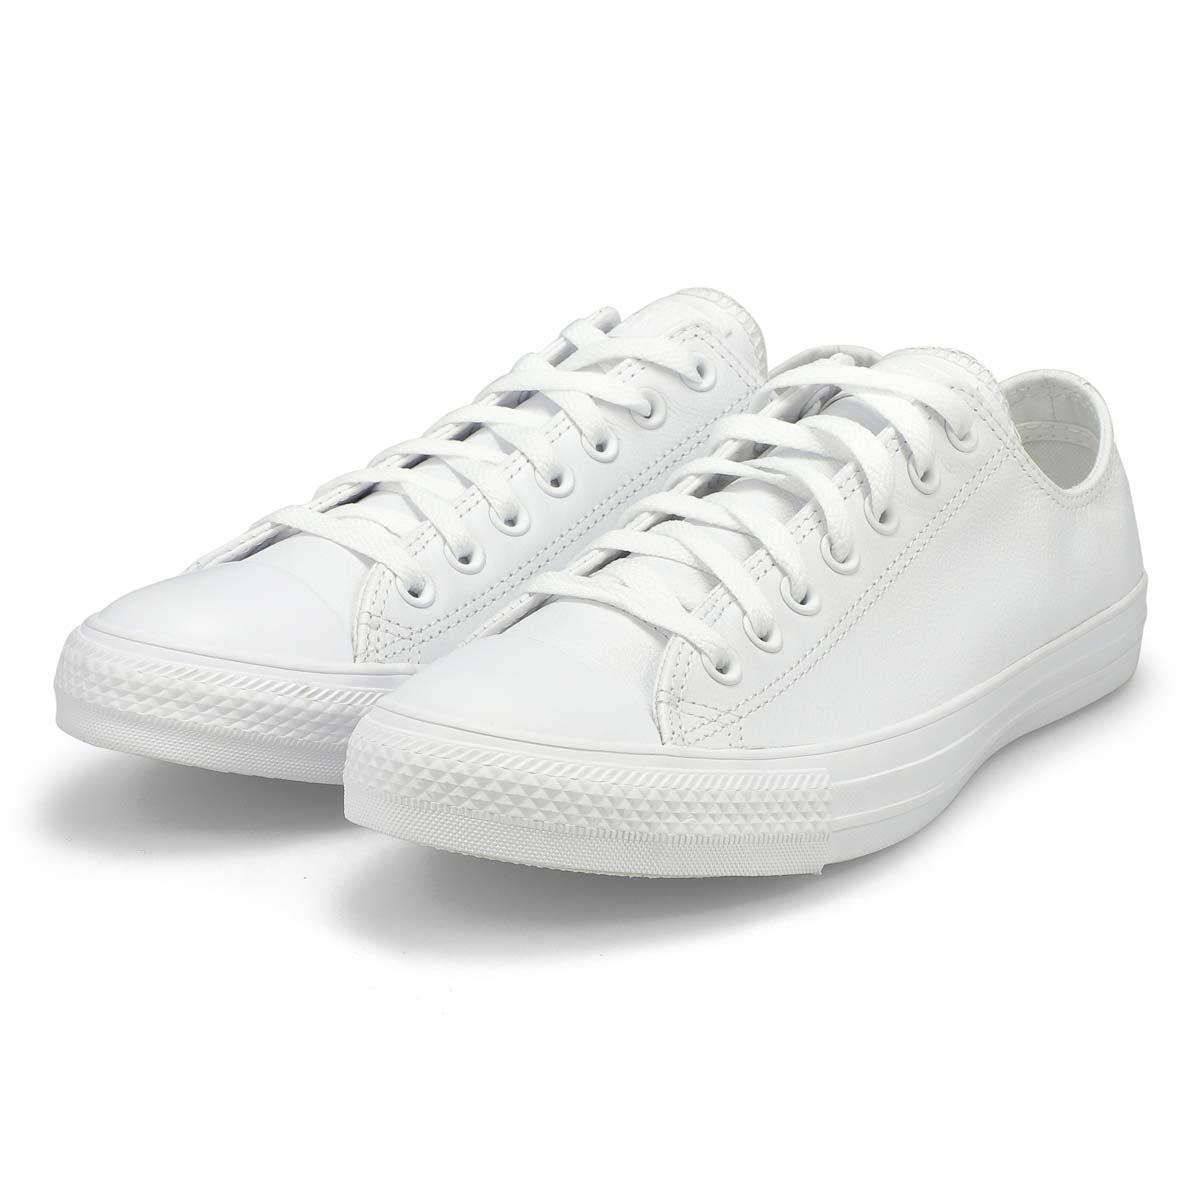 Men's Chuck Taylor All Star Sneaker - White